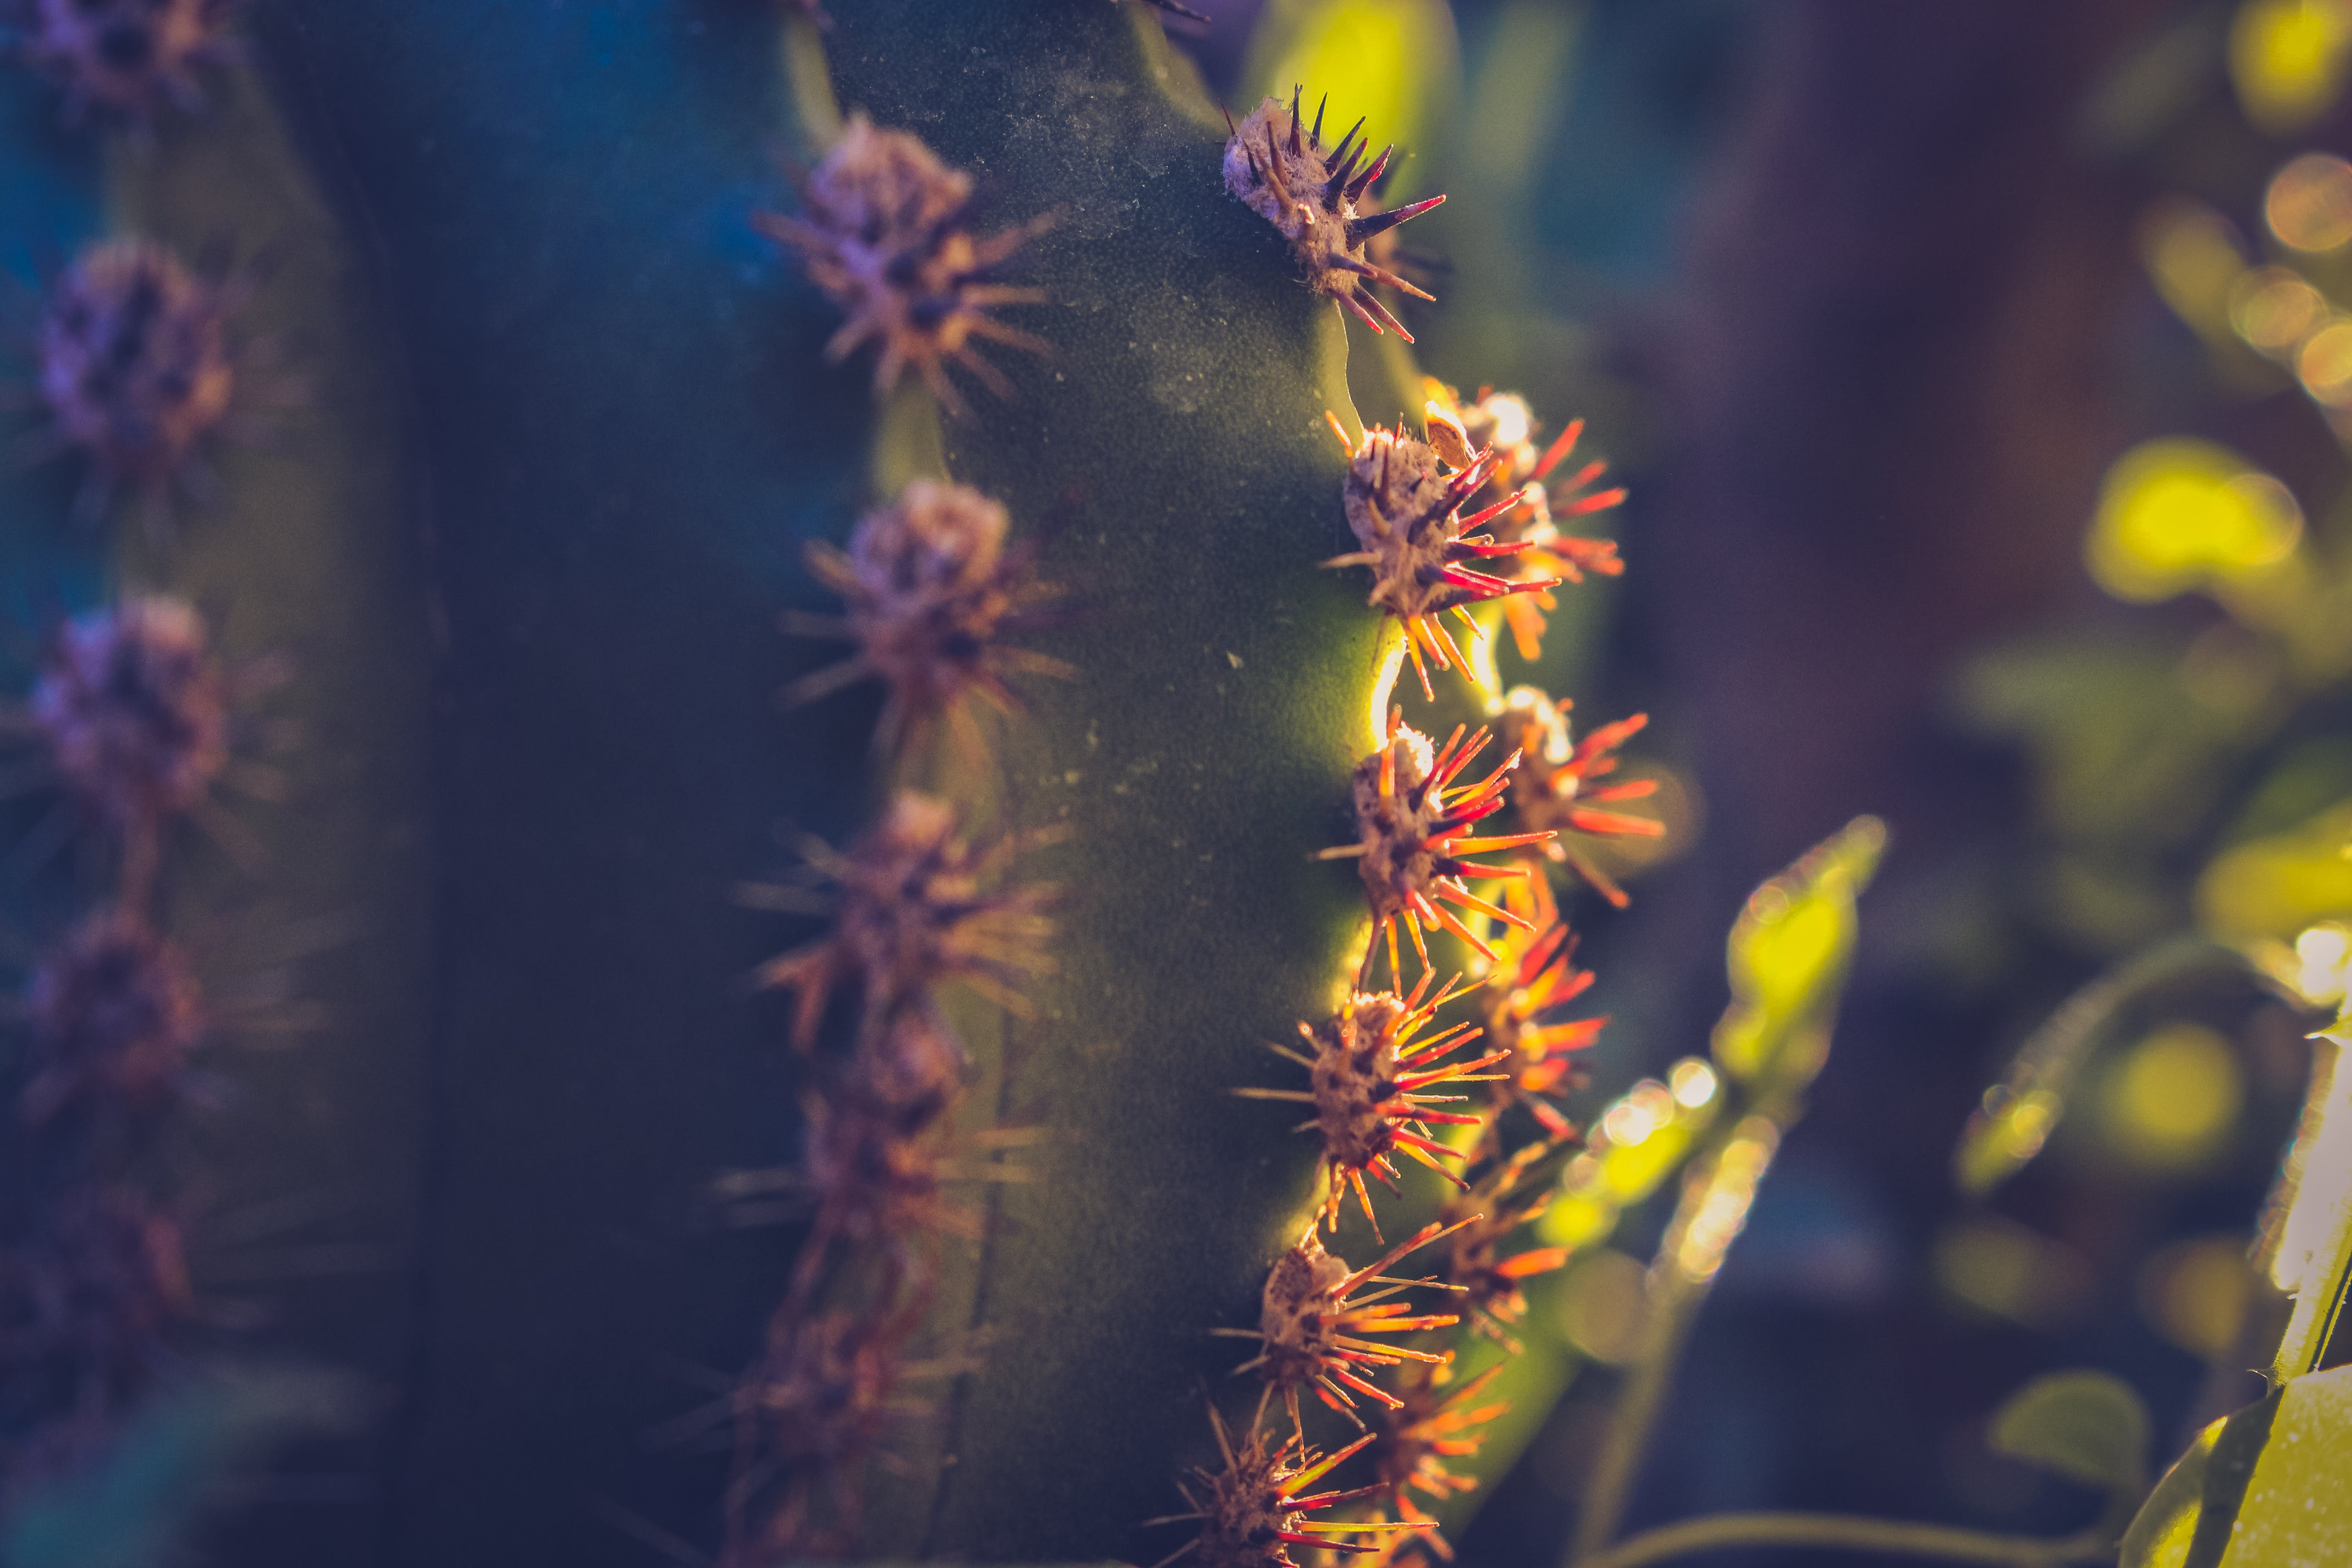 Shallow Focus Photography of Cactus